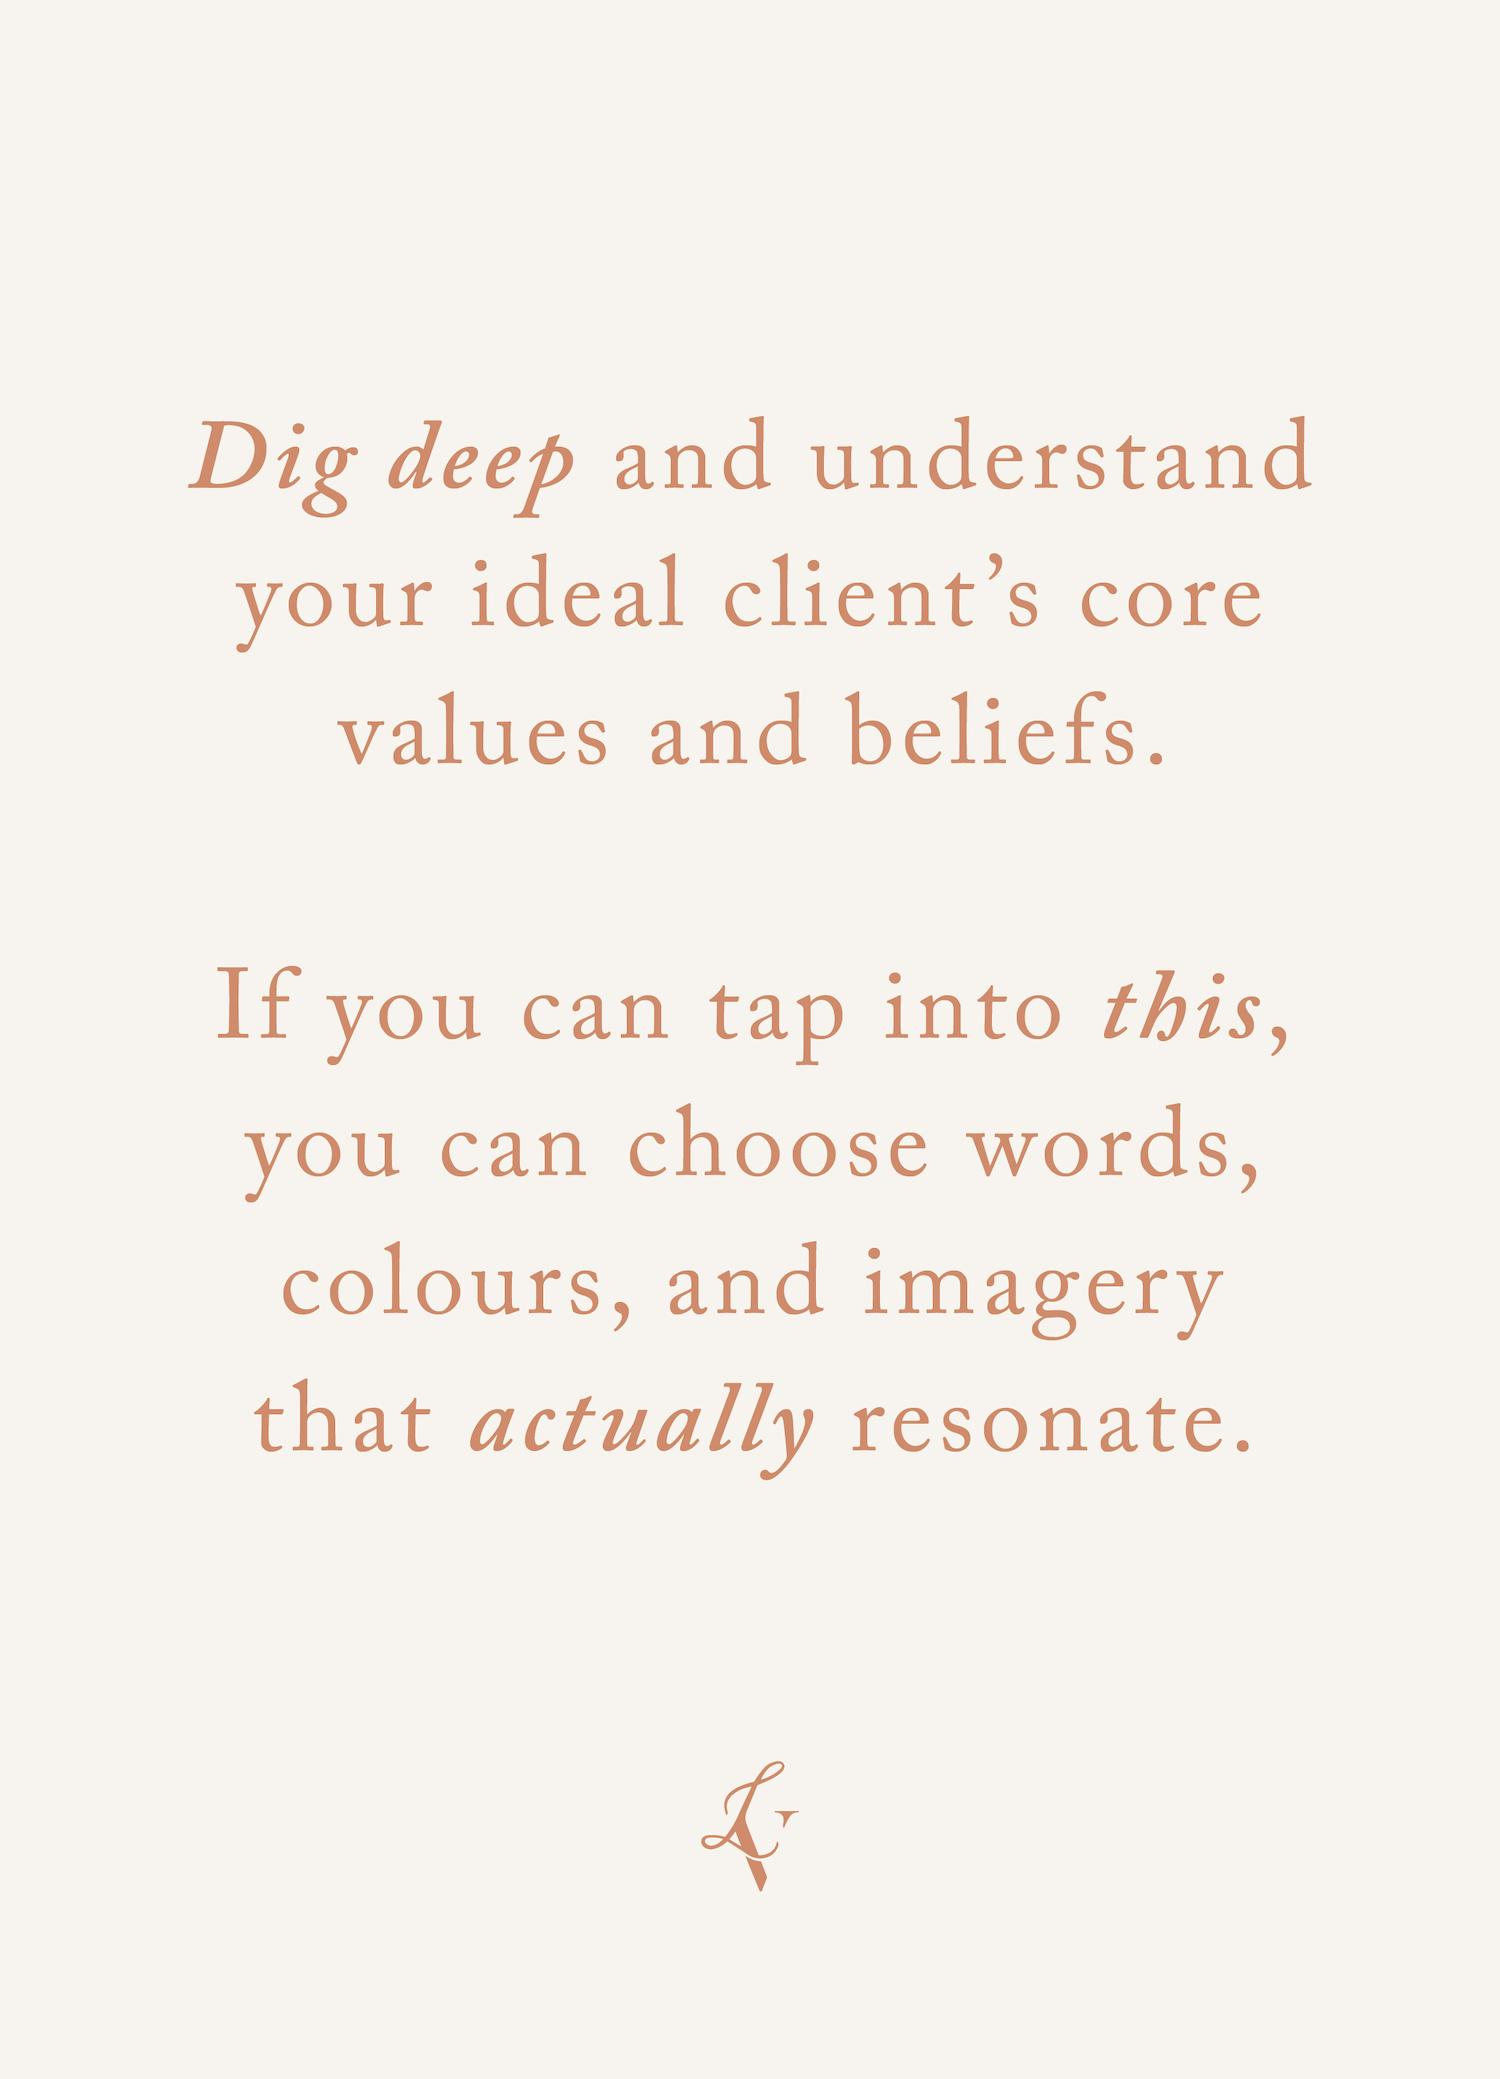 design-process-client-questionnaire-branding.jpg